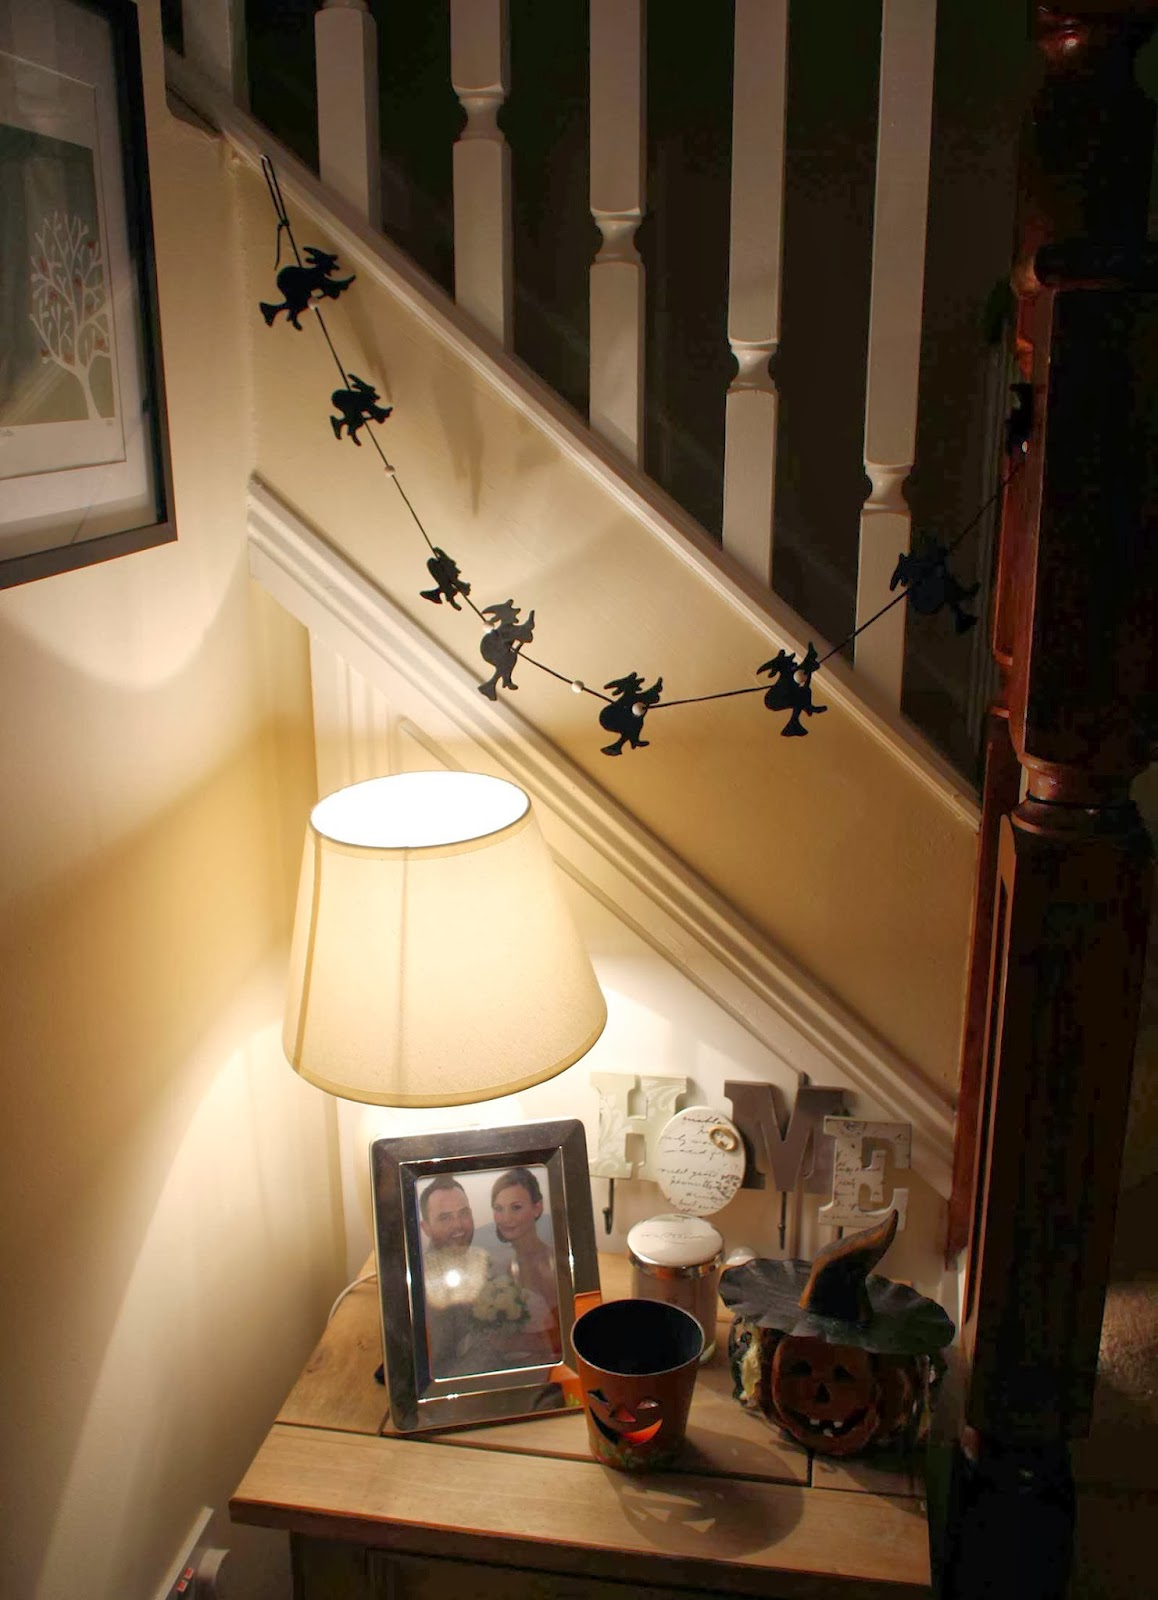 Halloween decor 2013 anna saccone joly - Deco hal halloween ...